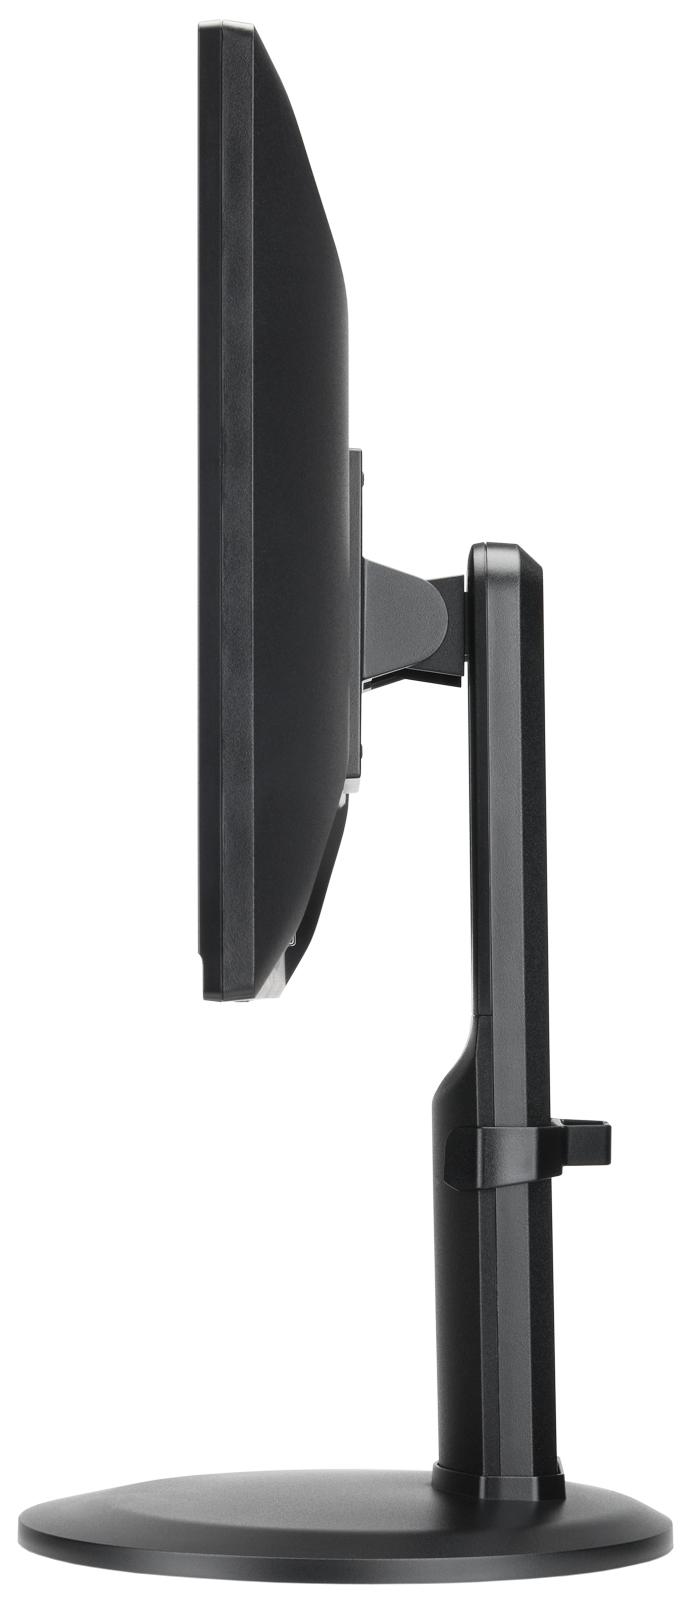 Iiyama ProLite B2280HS-B1 21.5Zoll Full HD TN Matt Schwarz Computerbildschirm LED display